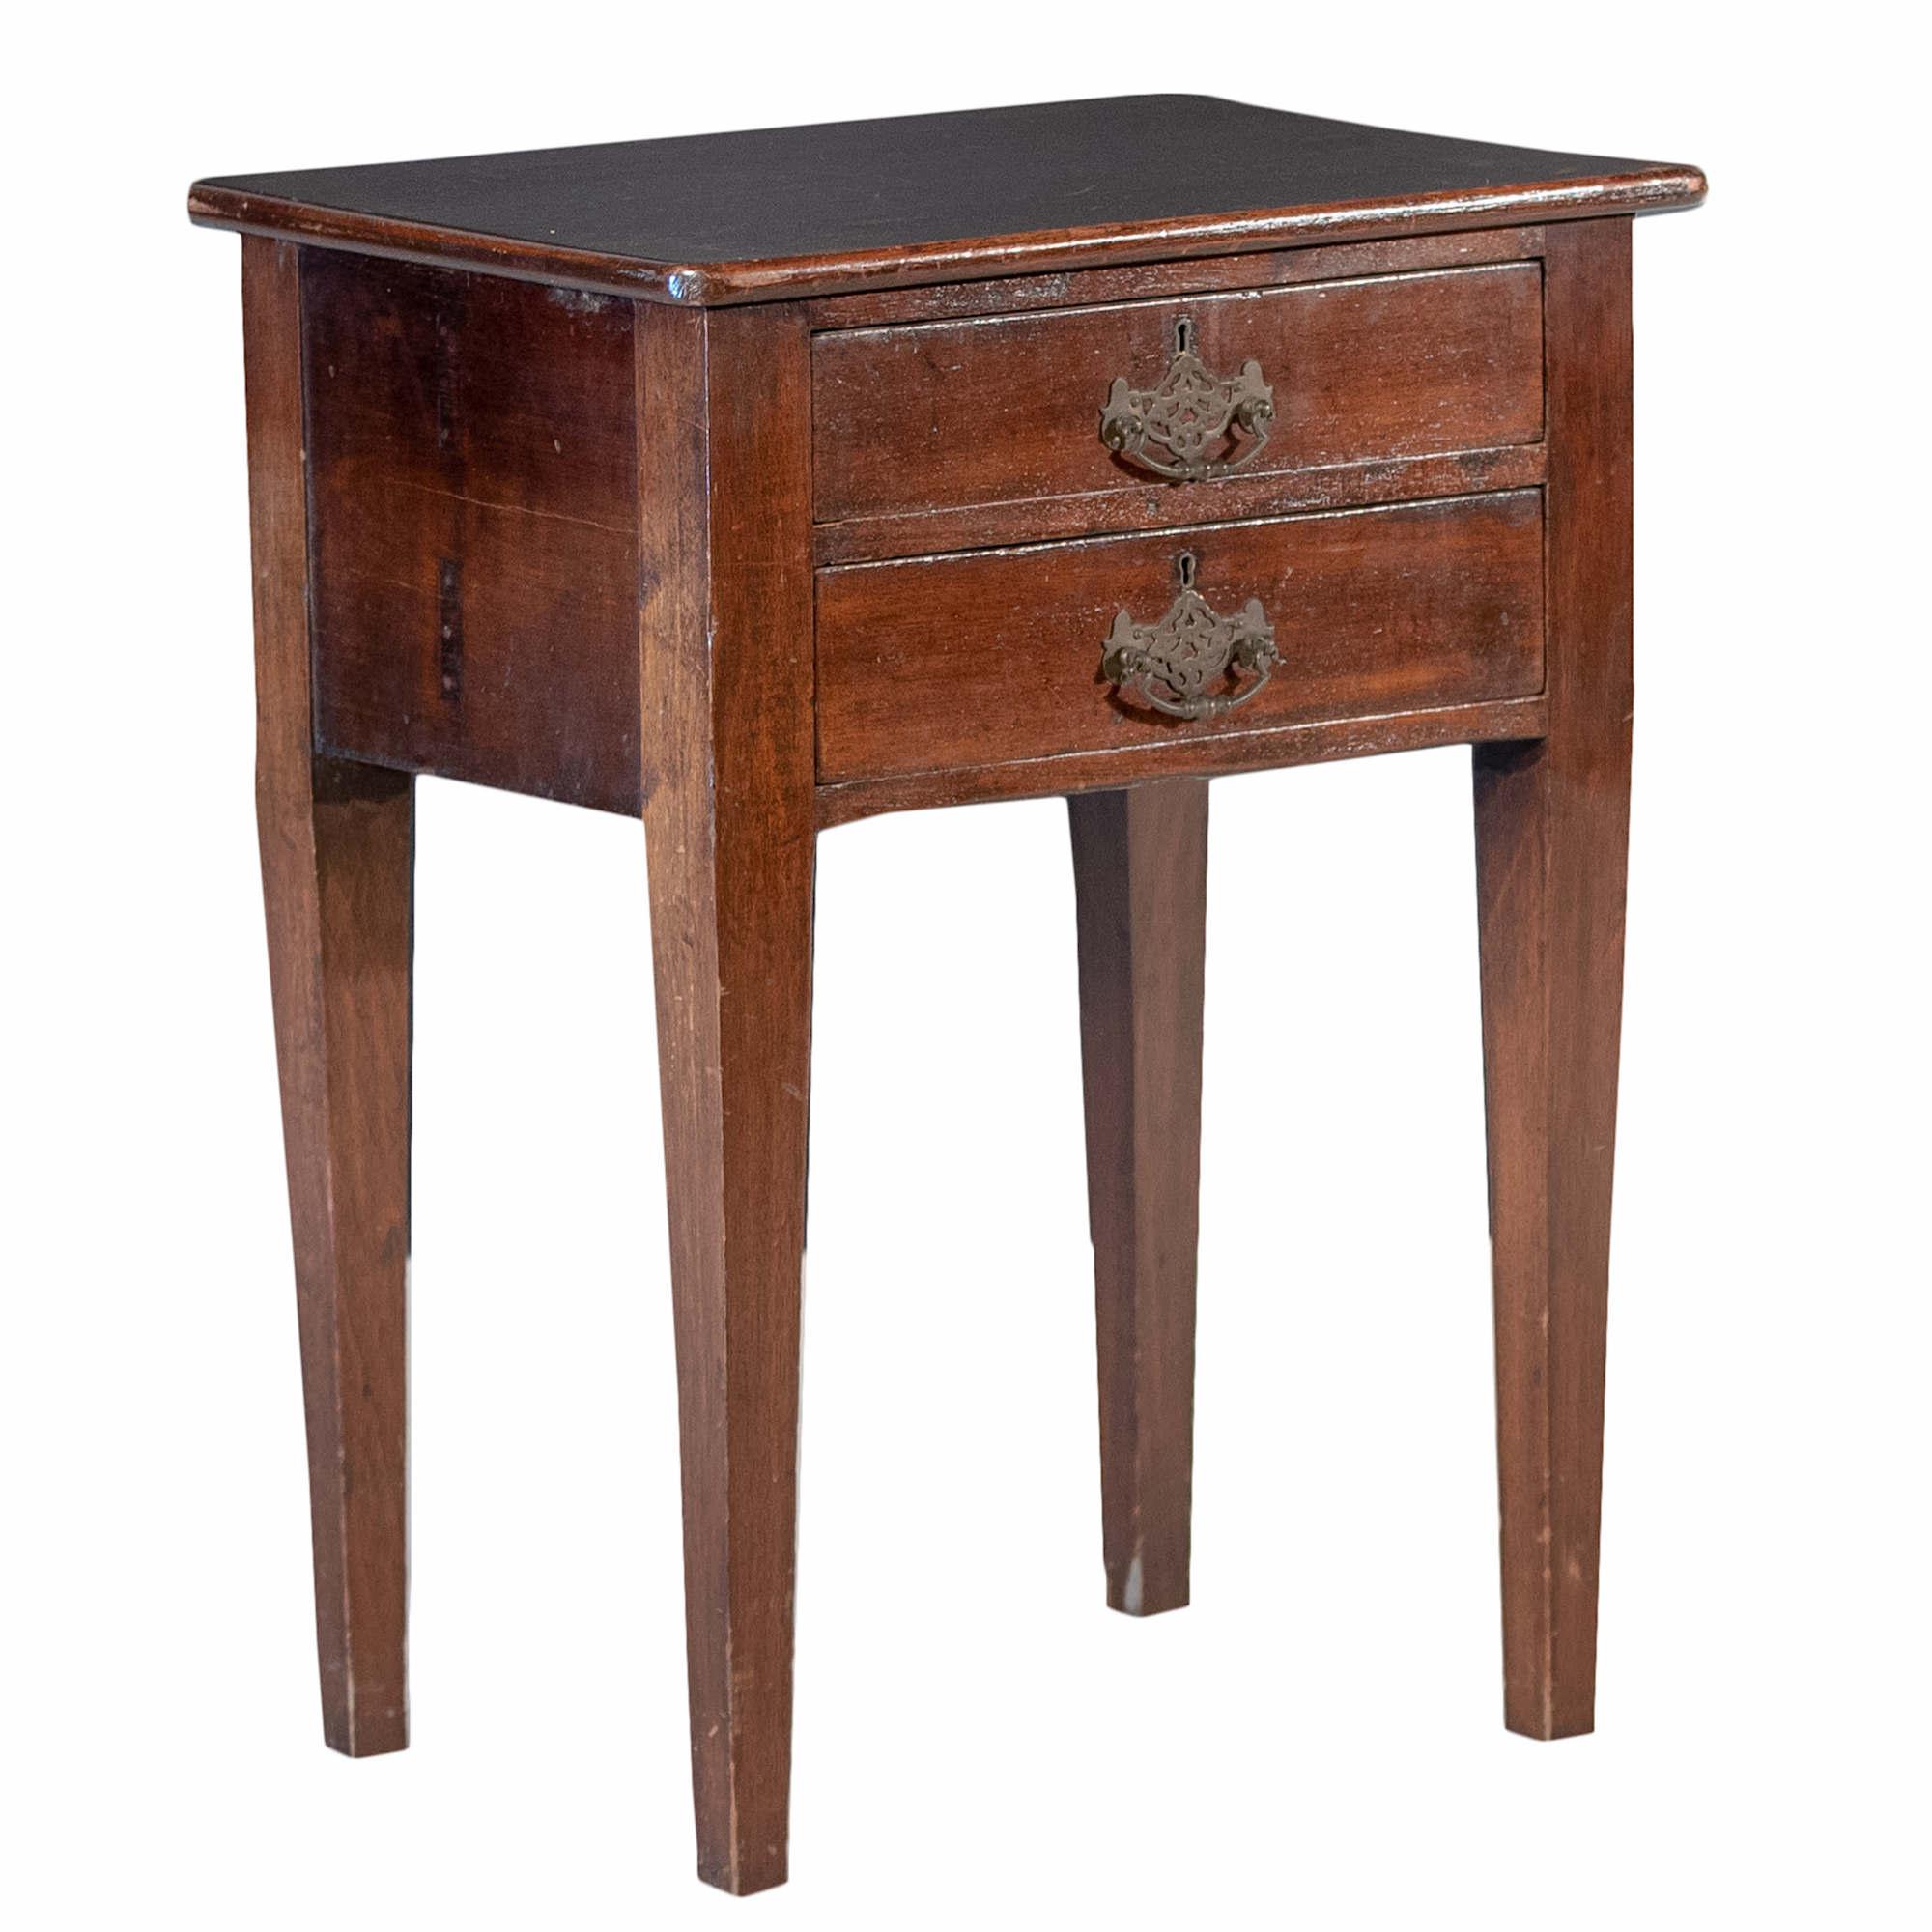 'Australian Cedar Two Drawer Work Table 19th Century'